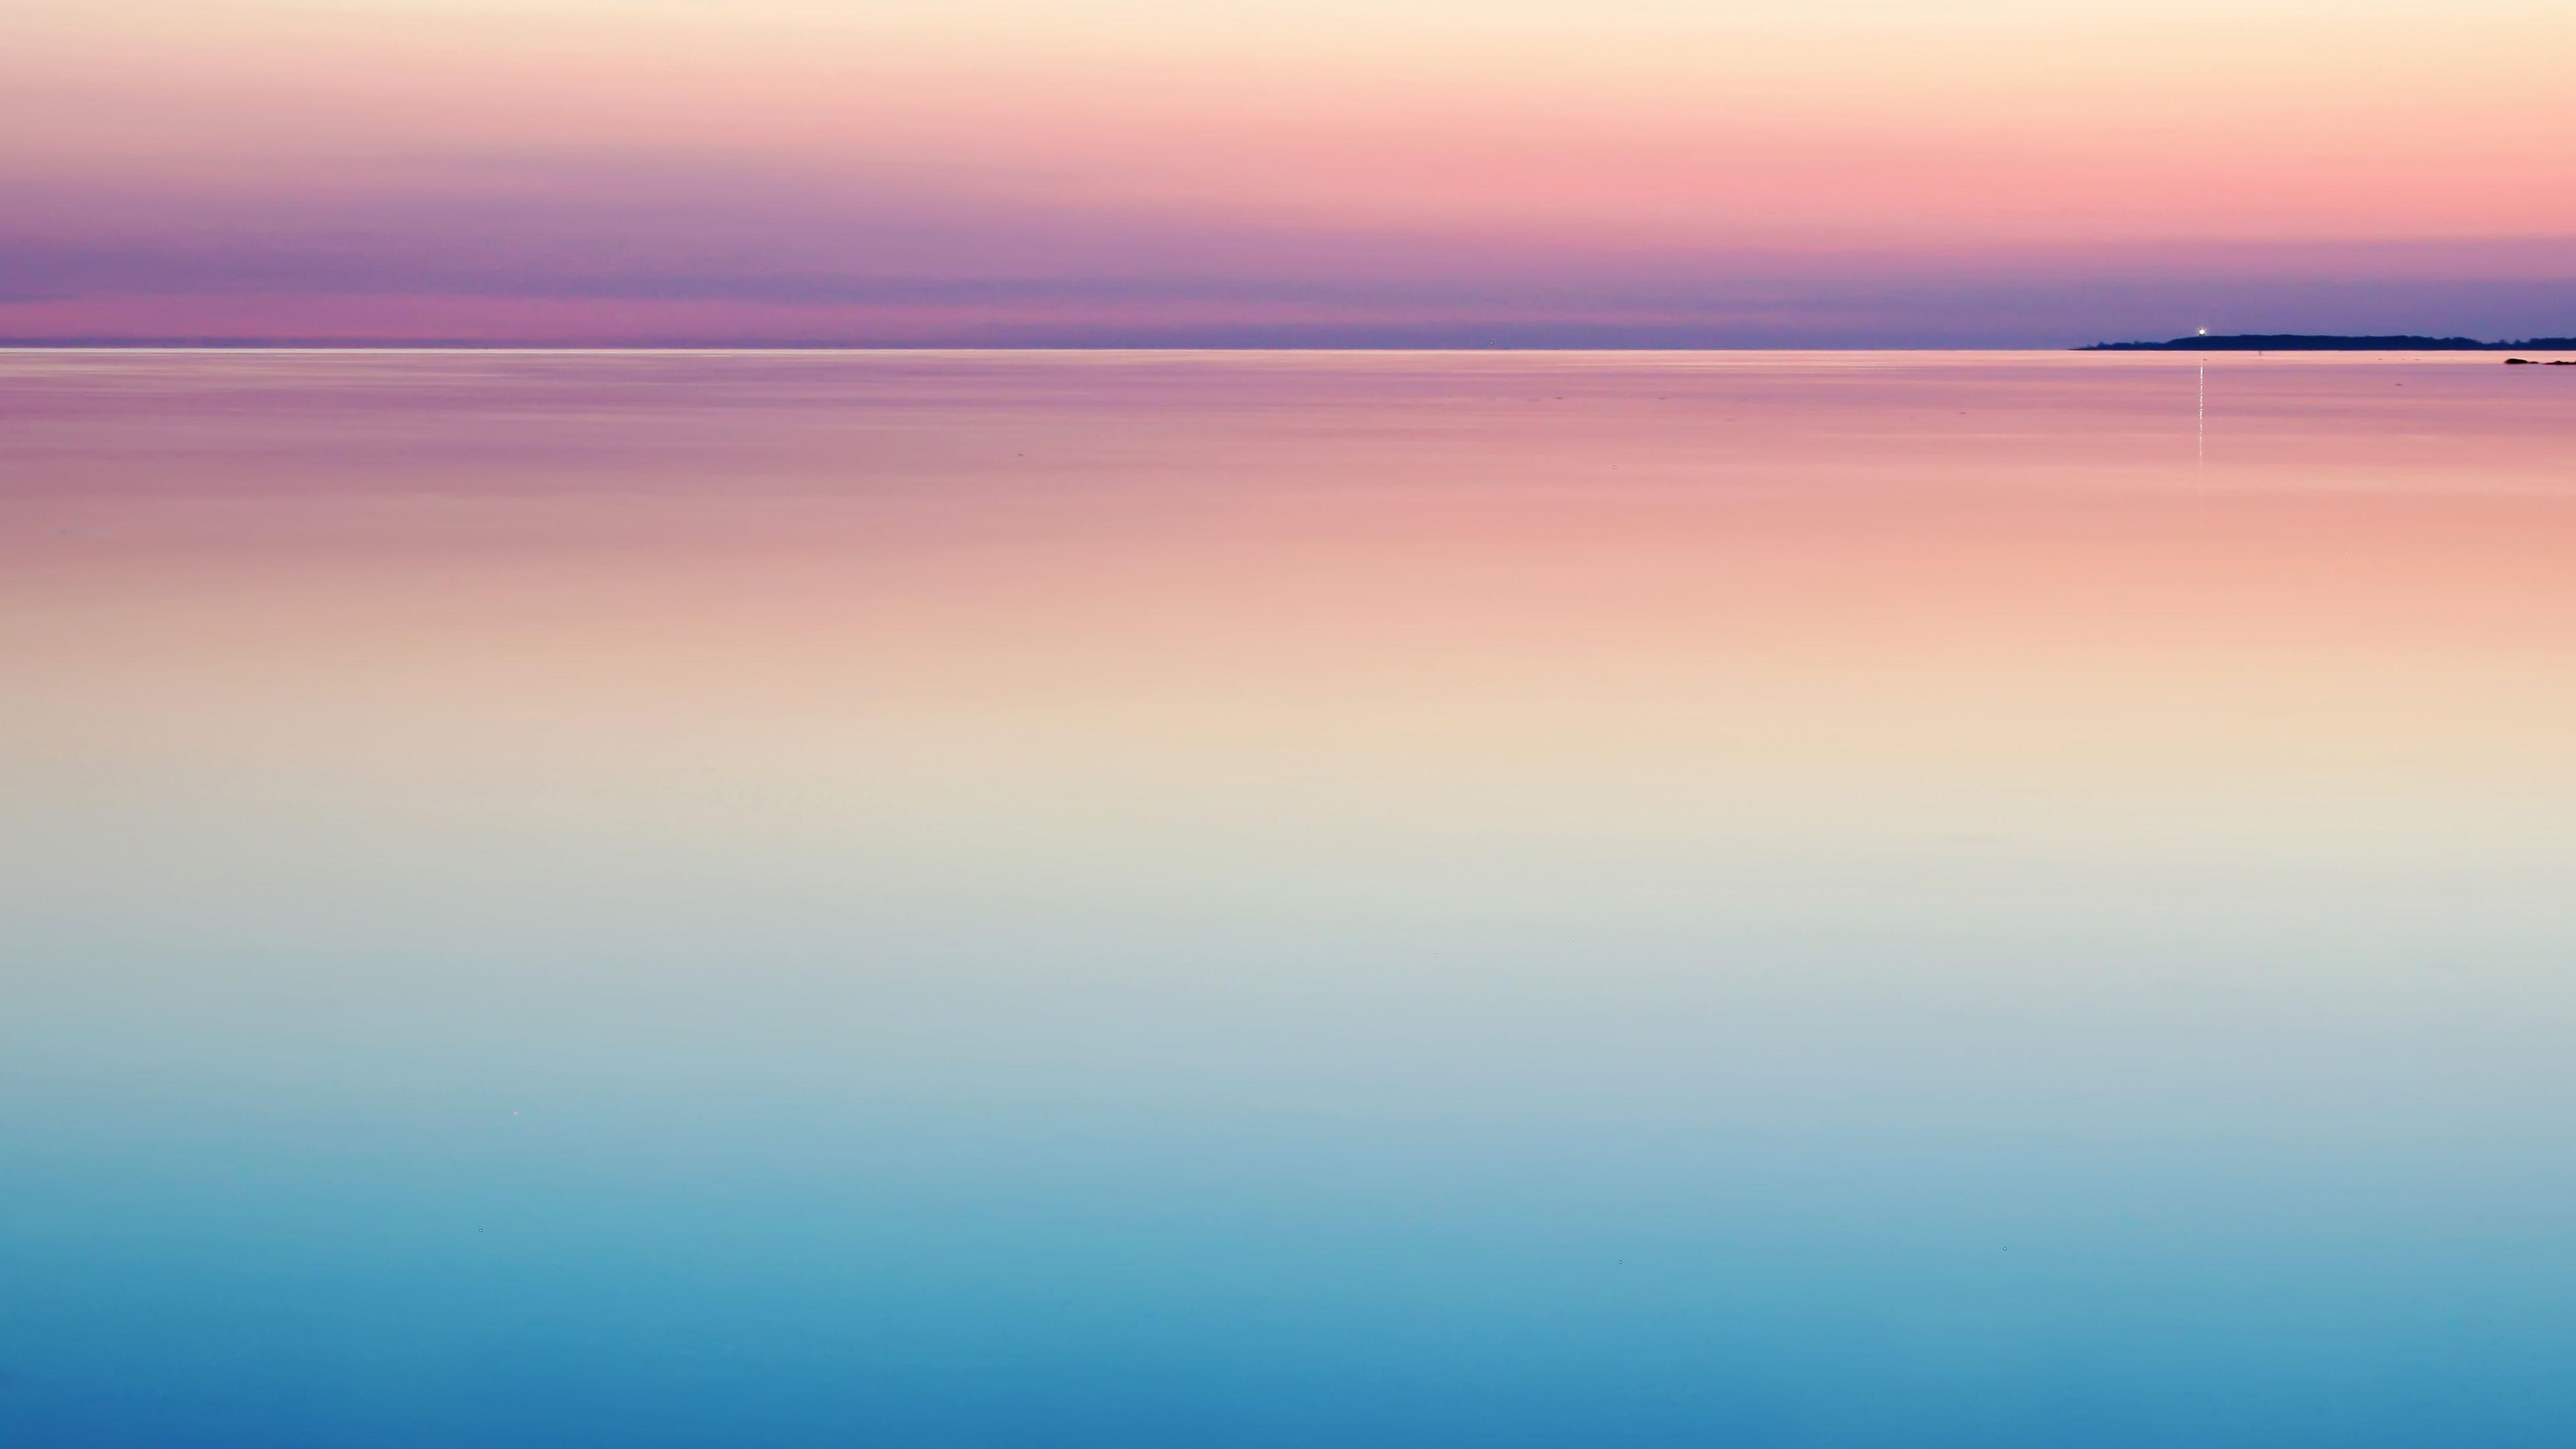 calm peaceful colorful sea water sunset 4k 1540141112 - Calm Peaceful Colorful Sea Water Sunset 4k - water wallpapers, sunset wallpapers, sea wallpapers, nature wallpapers, hd-wallpapers, colorful wallpapers, 5k wallpapers, 4k-wallpapers